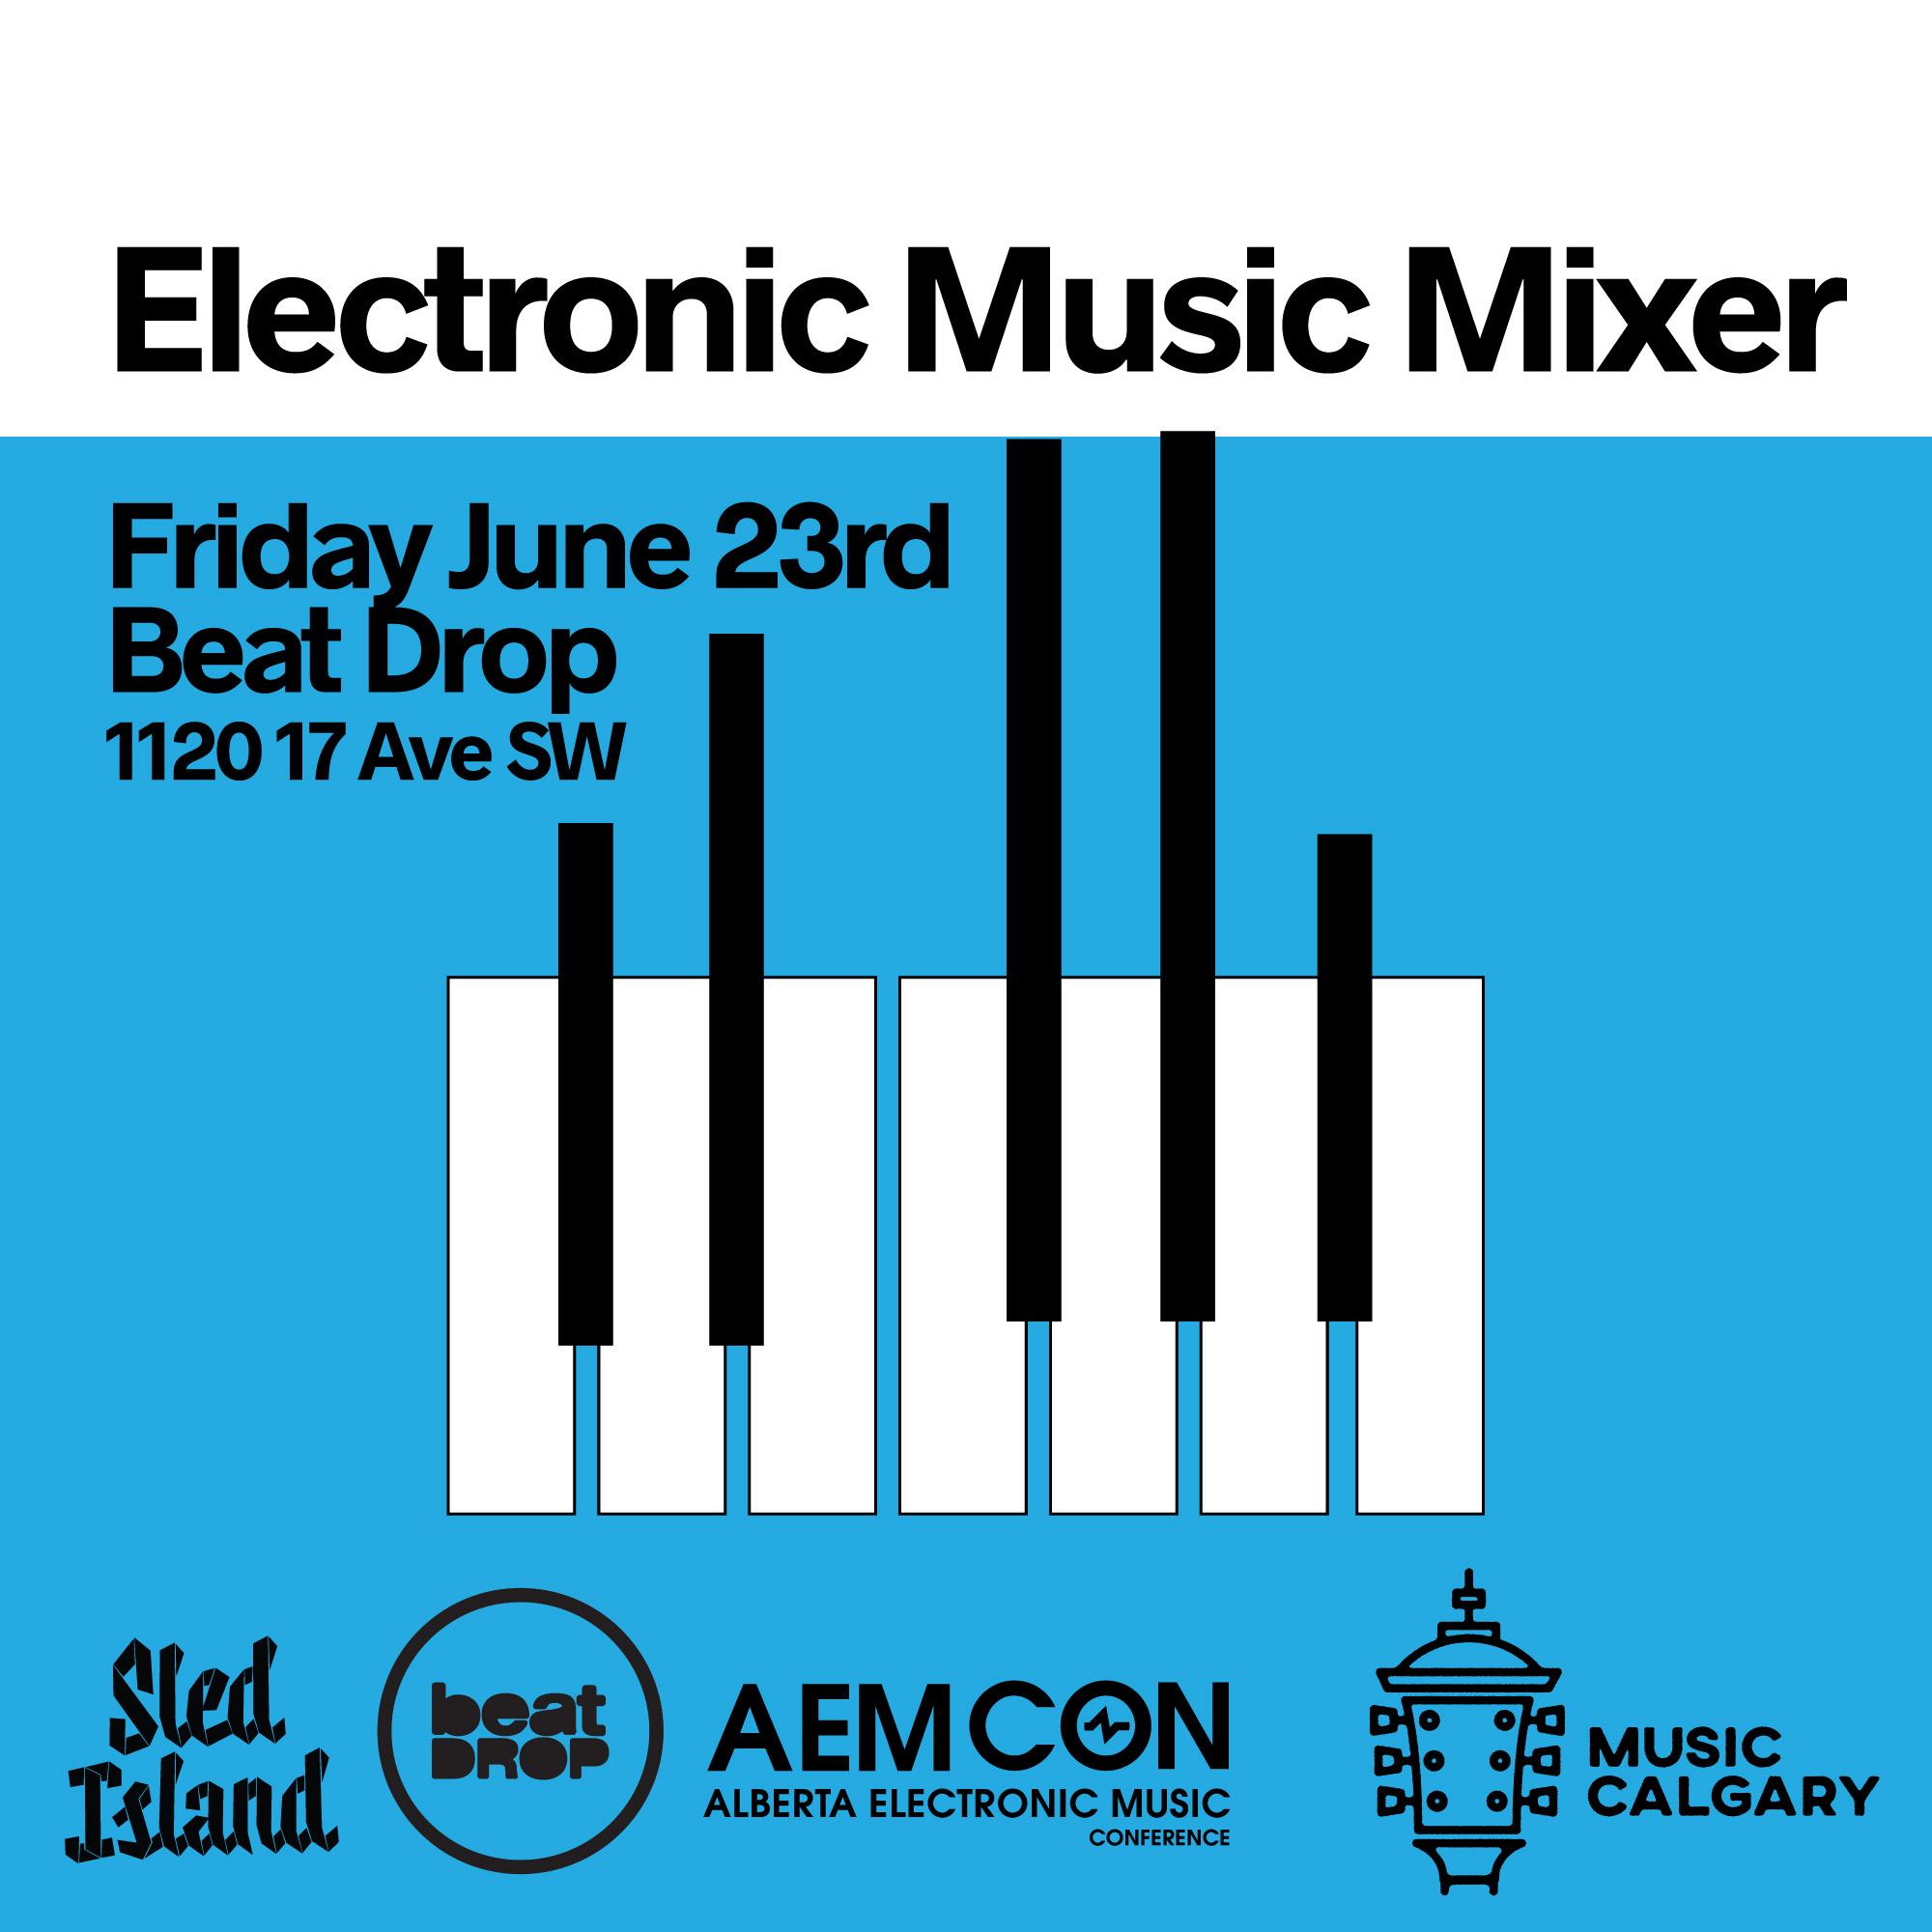 Sled Island, Alberta Electronic Music, AEMCON